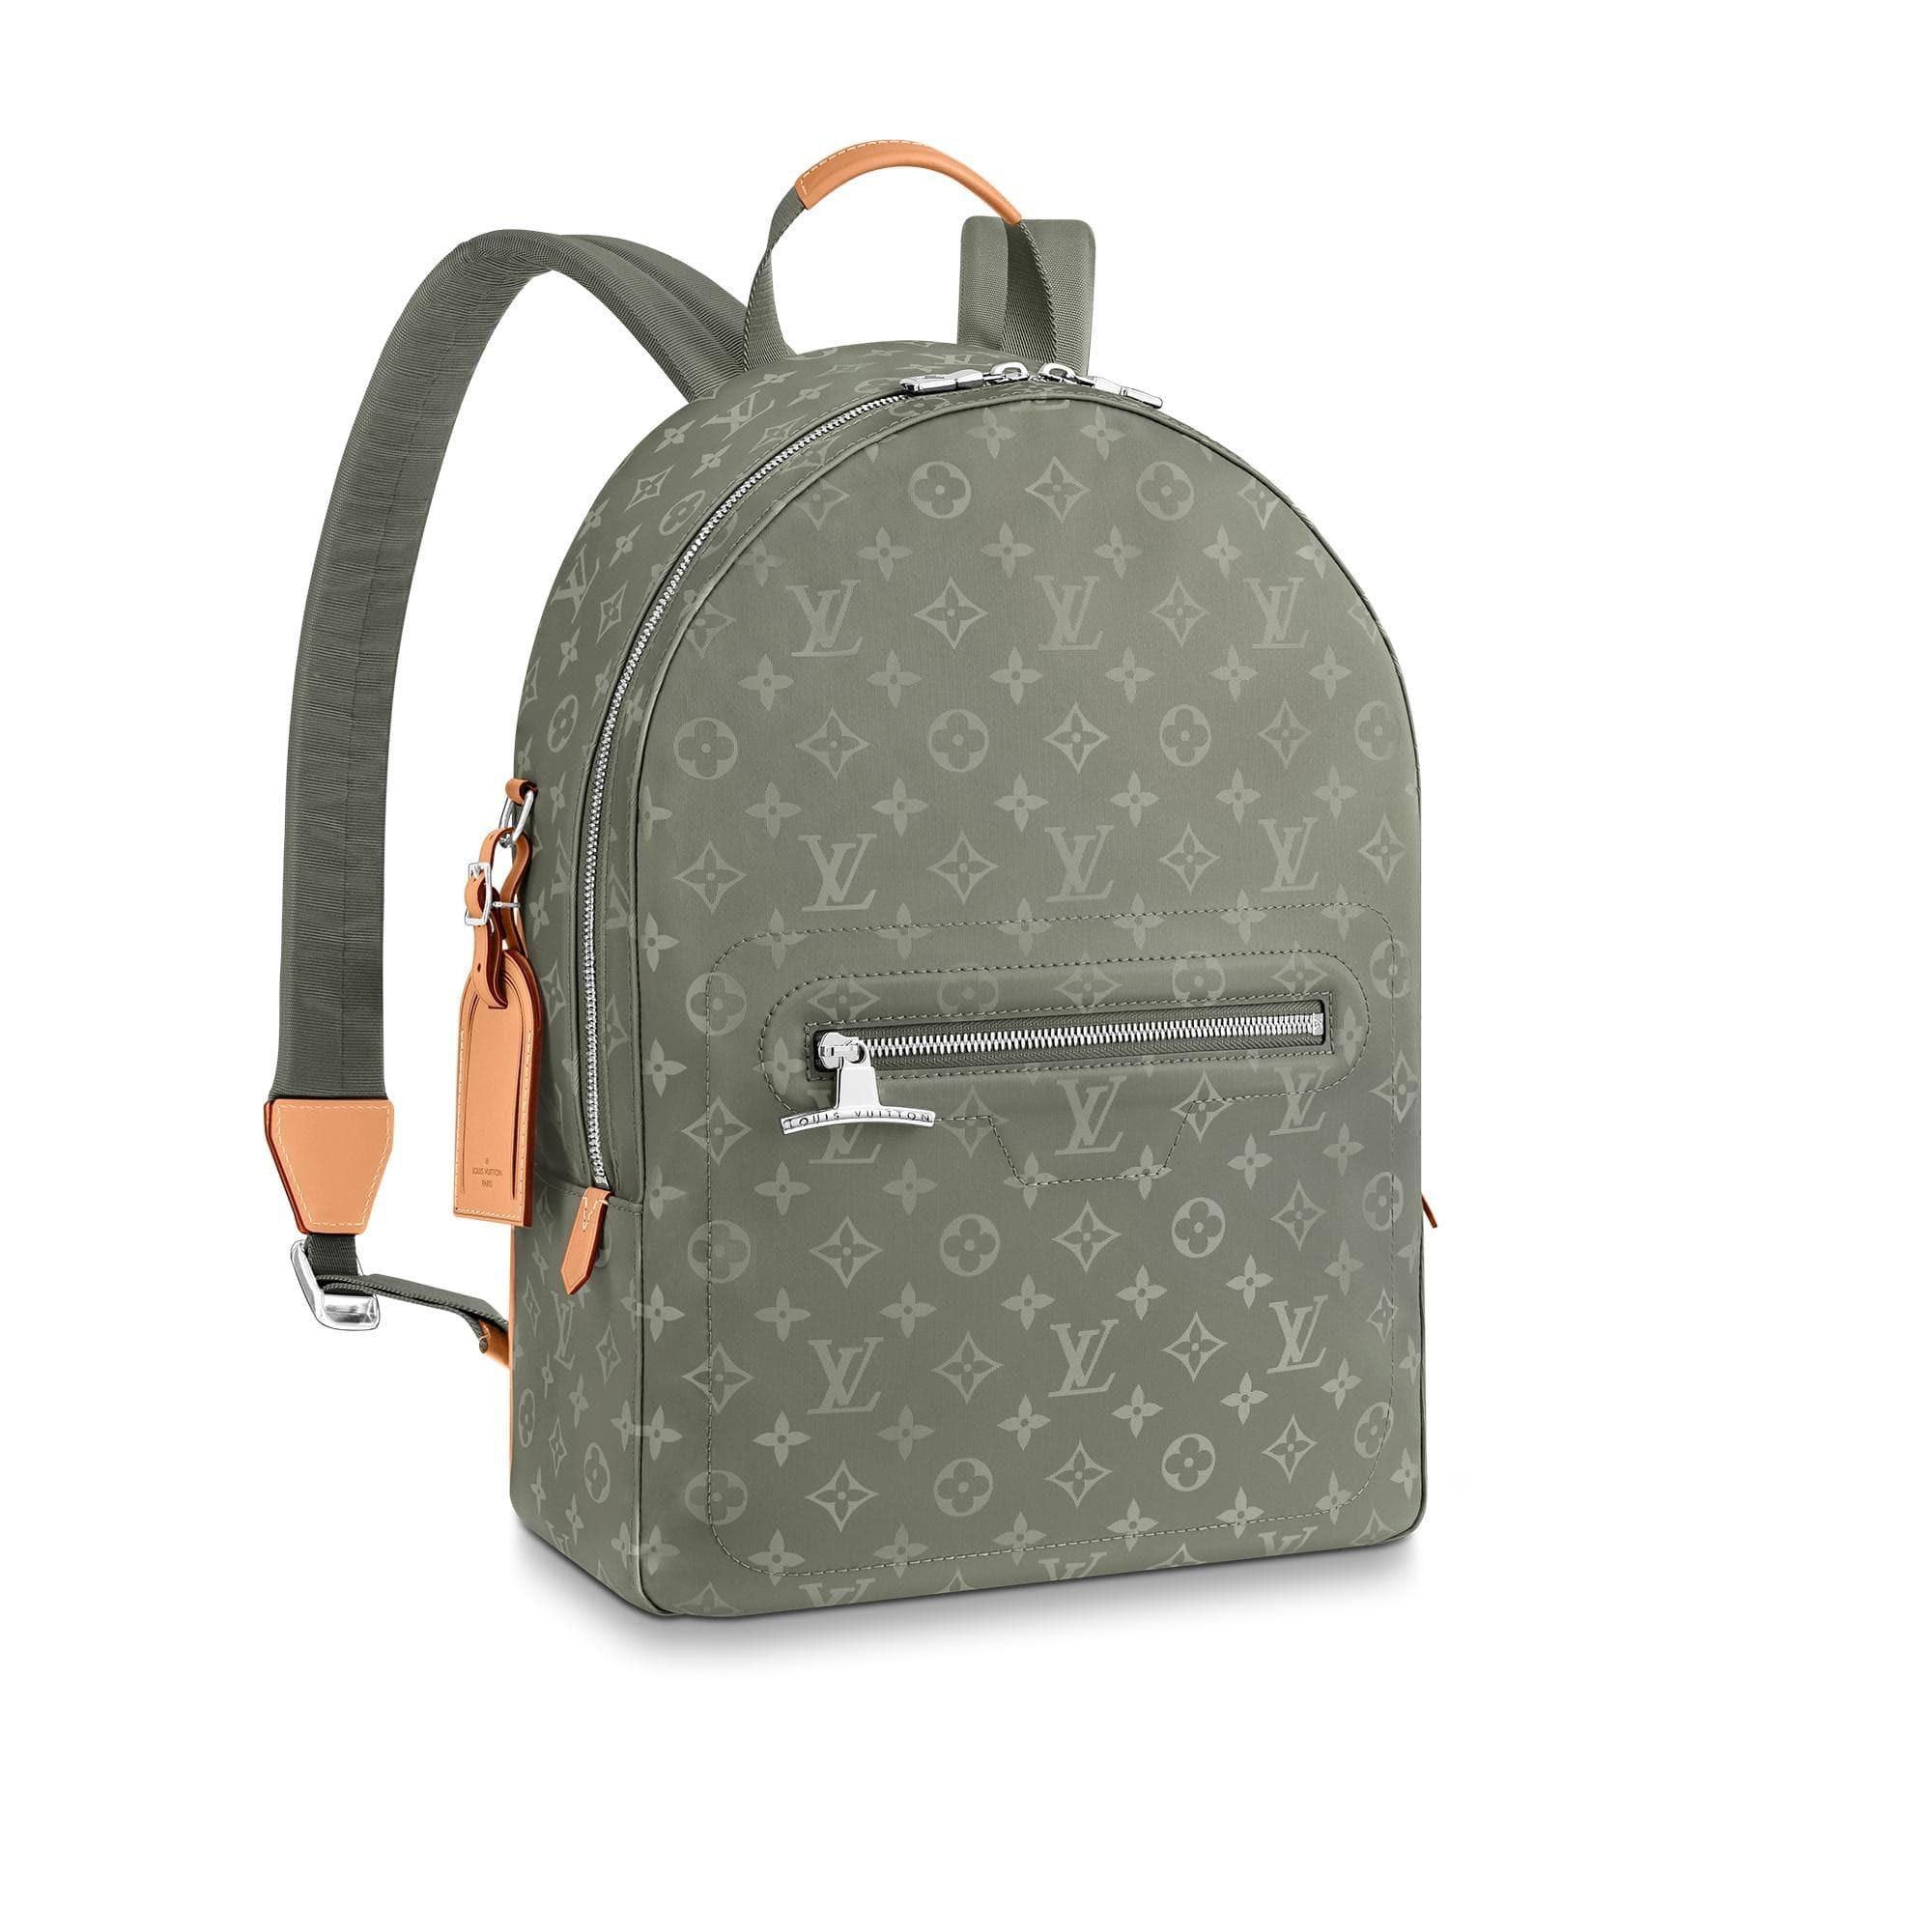 Louis Vuitton Backpack Monogram PM Grey